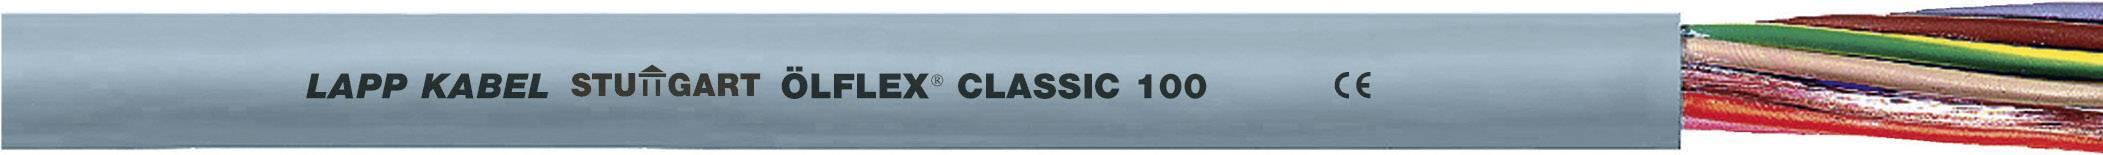 Kabel LappKabel Ölflex CLASSIC 100 2X4 (0010100), PVC, 10,4 mm, 750 V, šedá, 1000 m